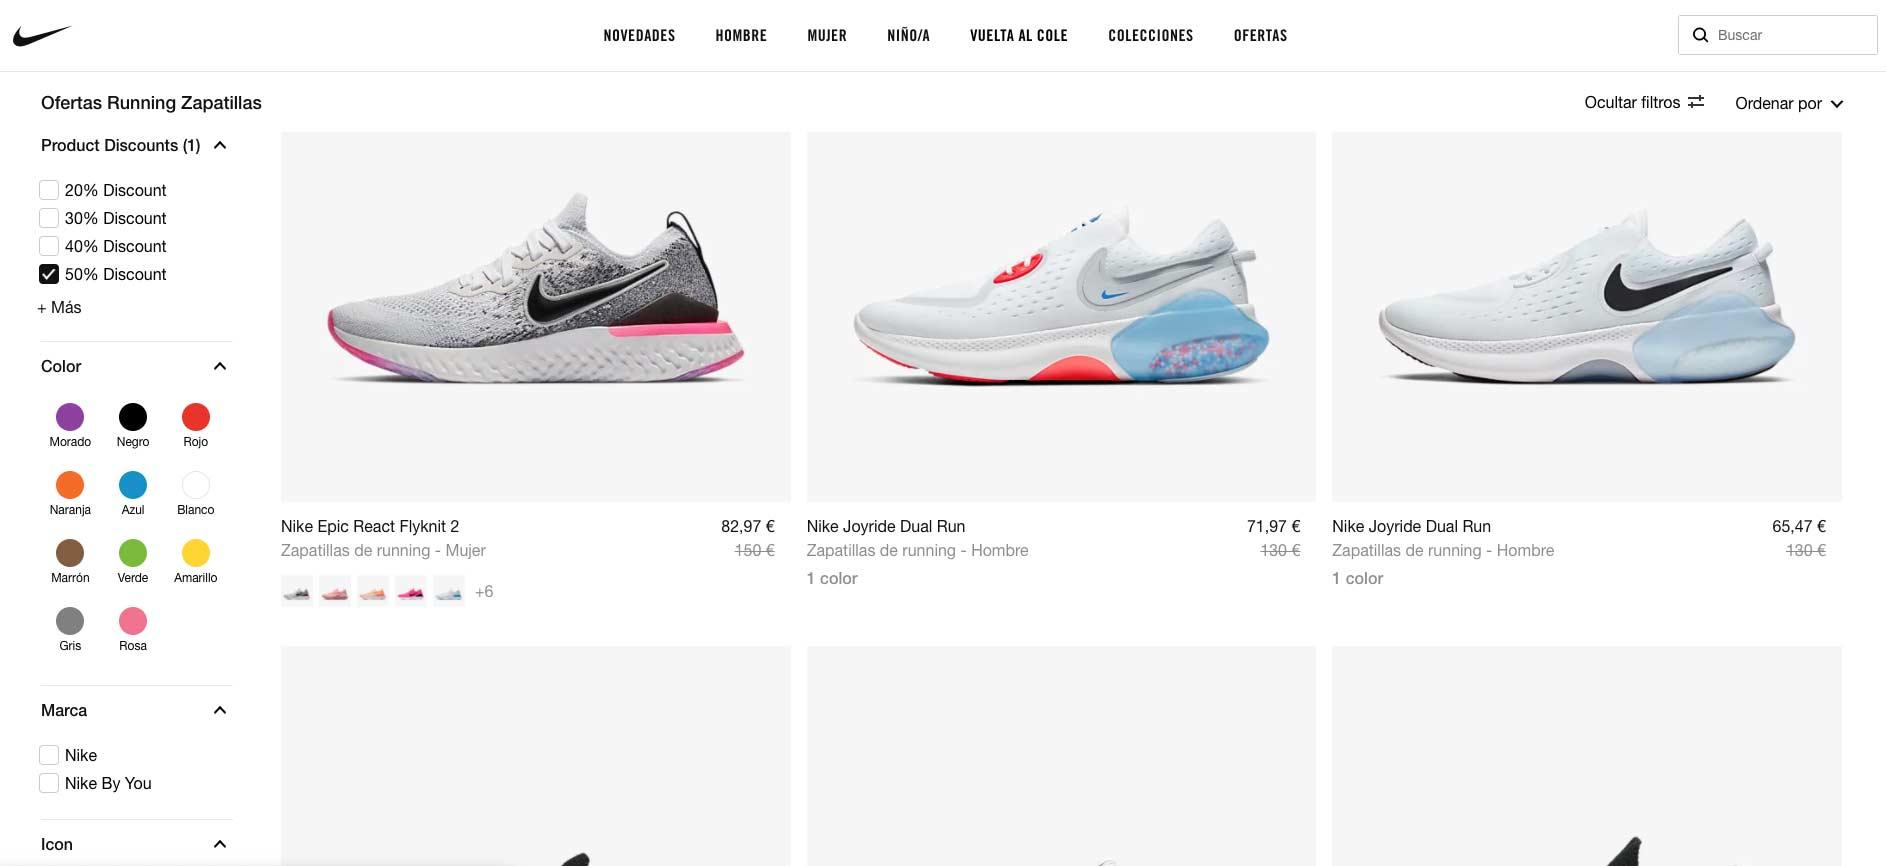 Nike - Ofertas zapatillas running Julio 2020